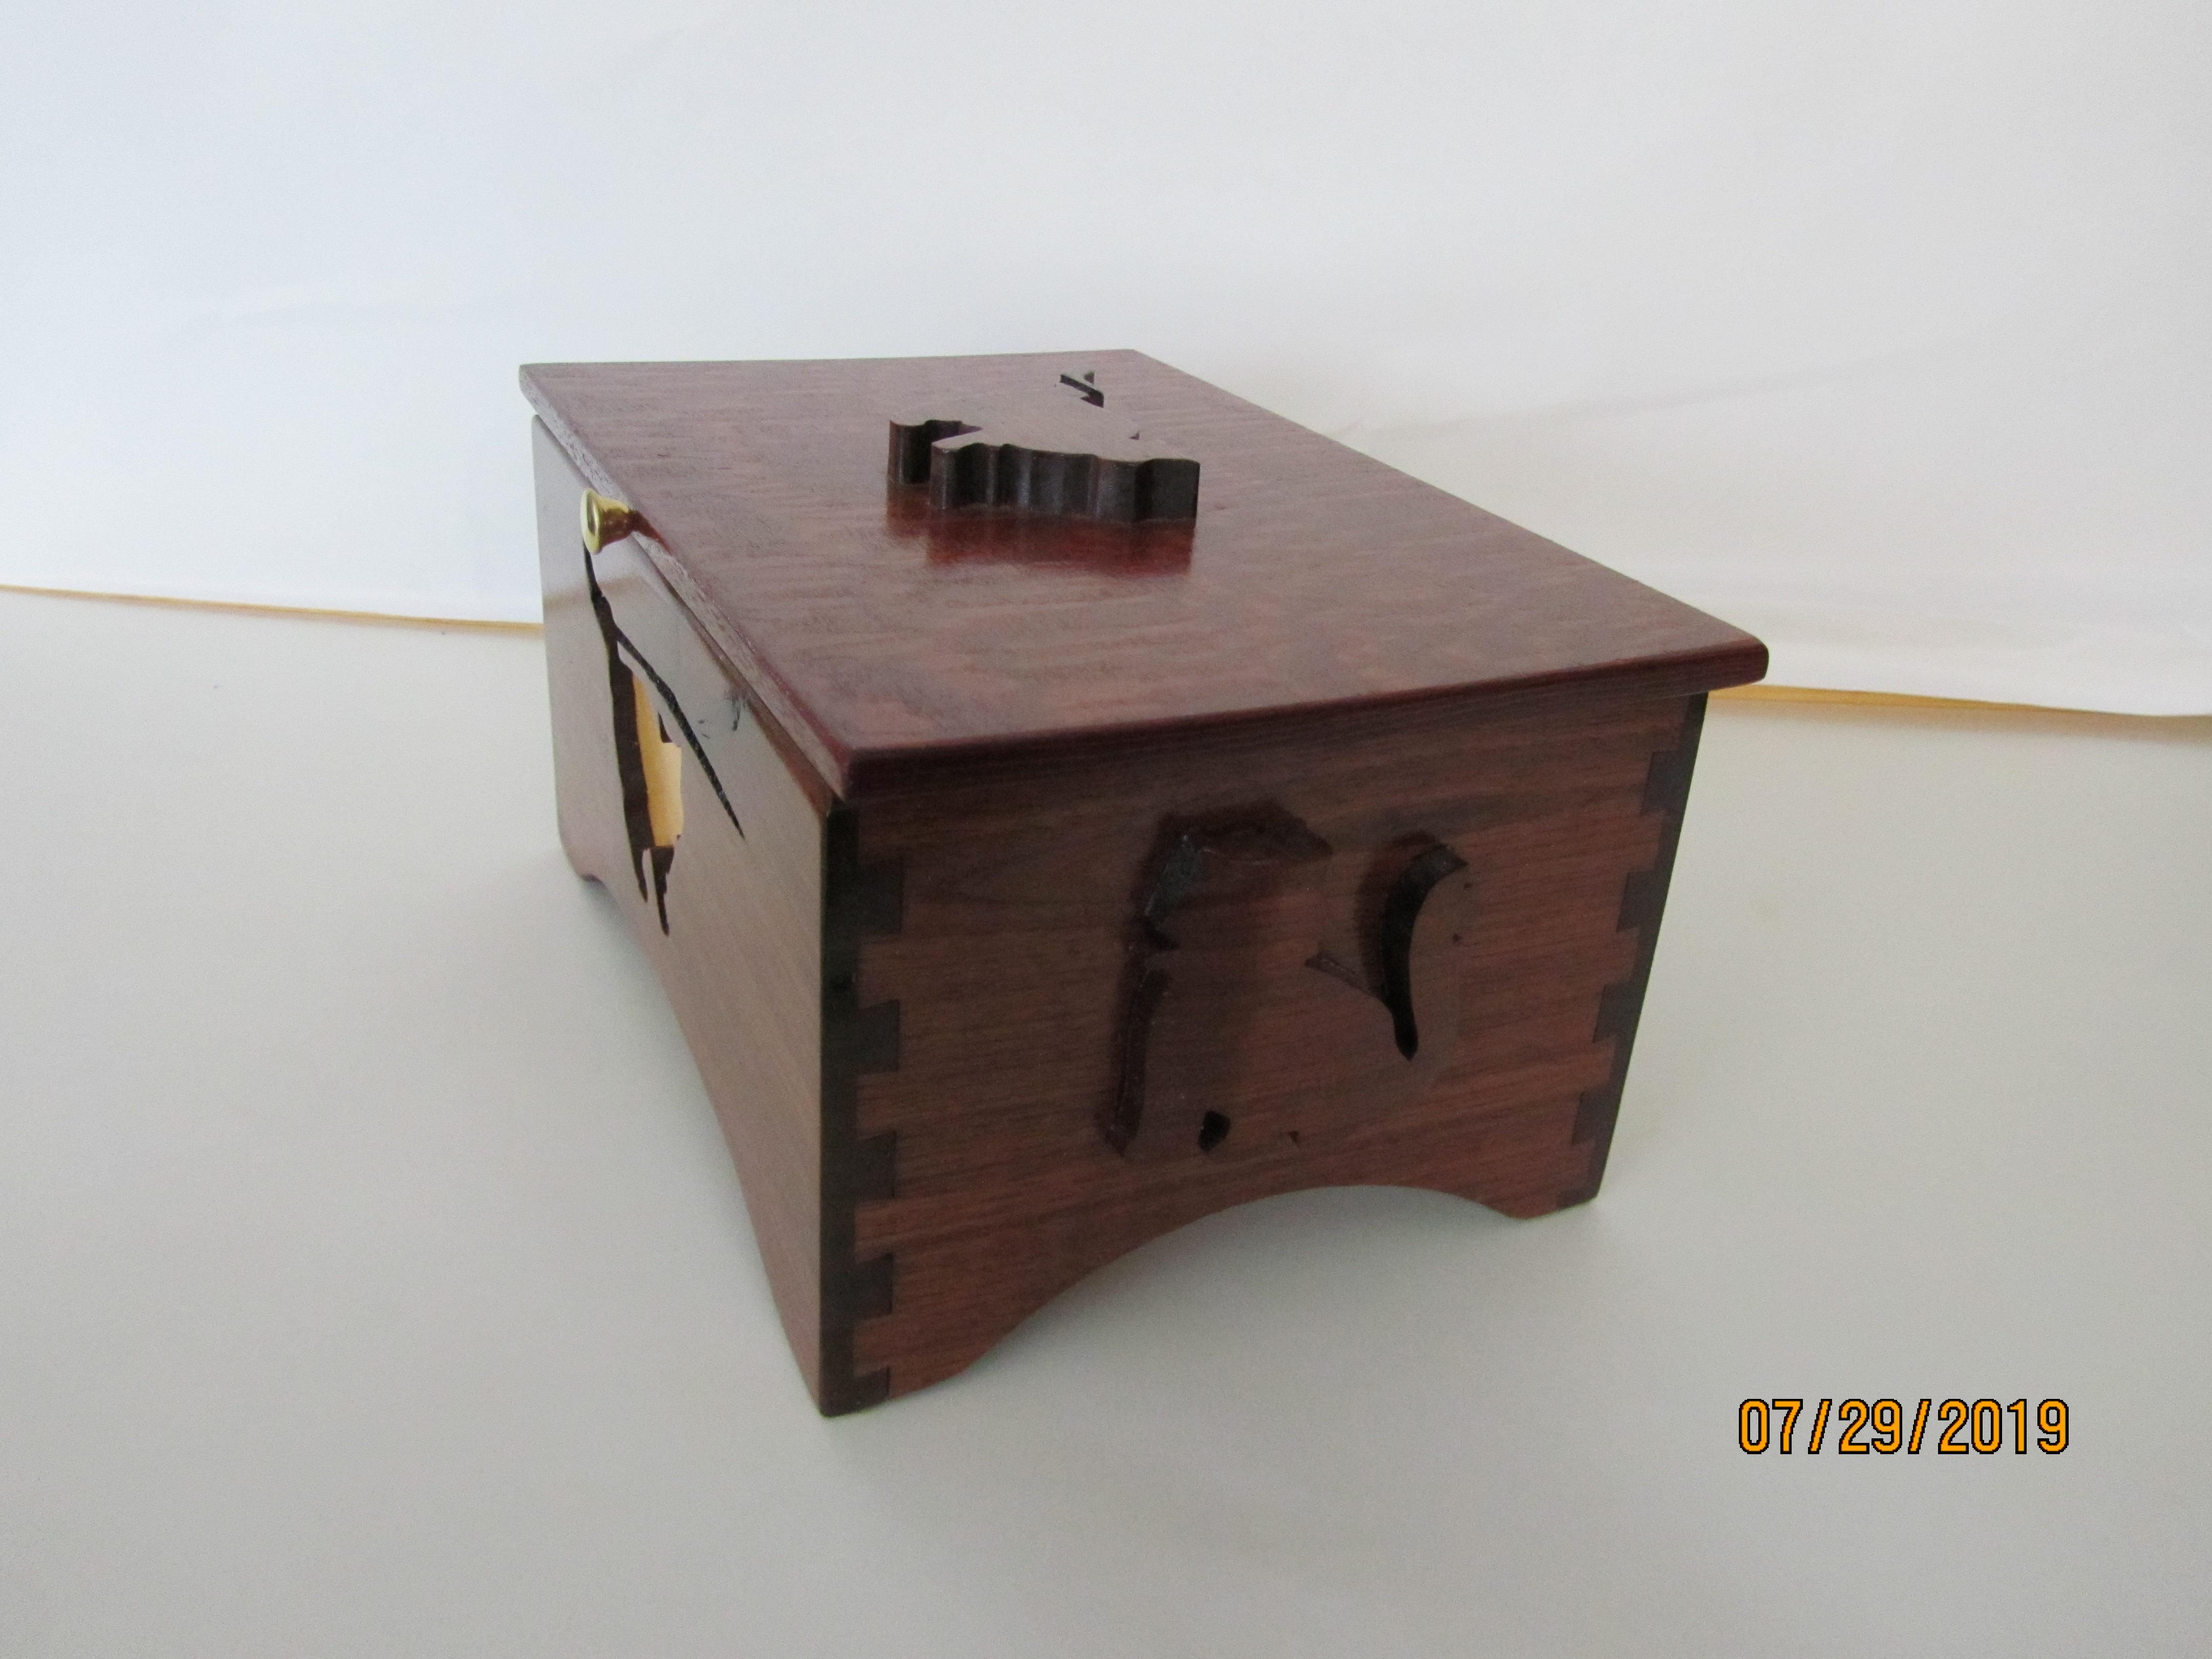 SOLD PB#183 $110 Cat Box